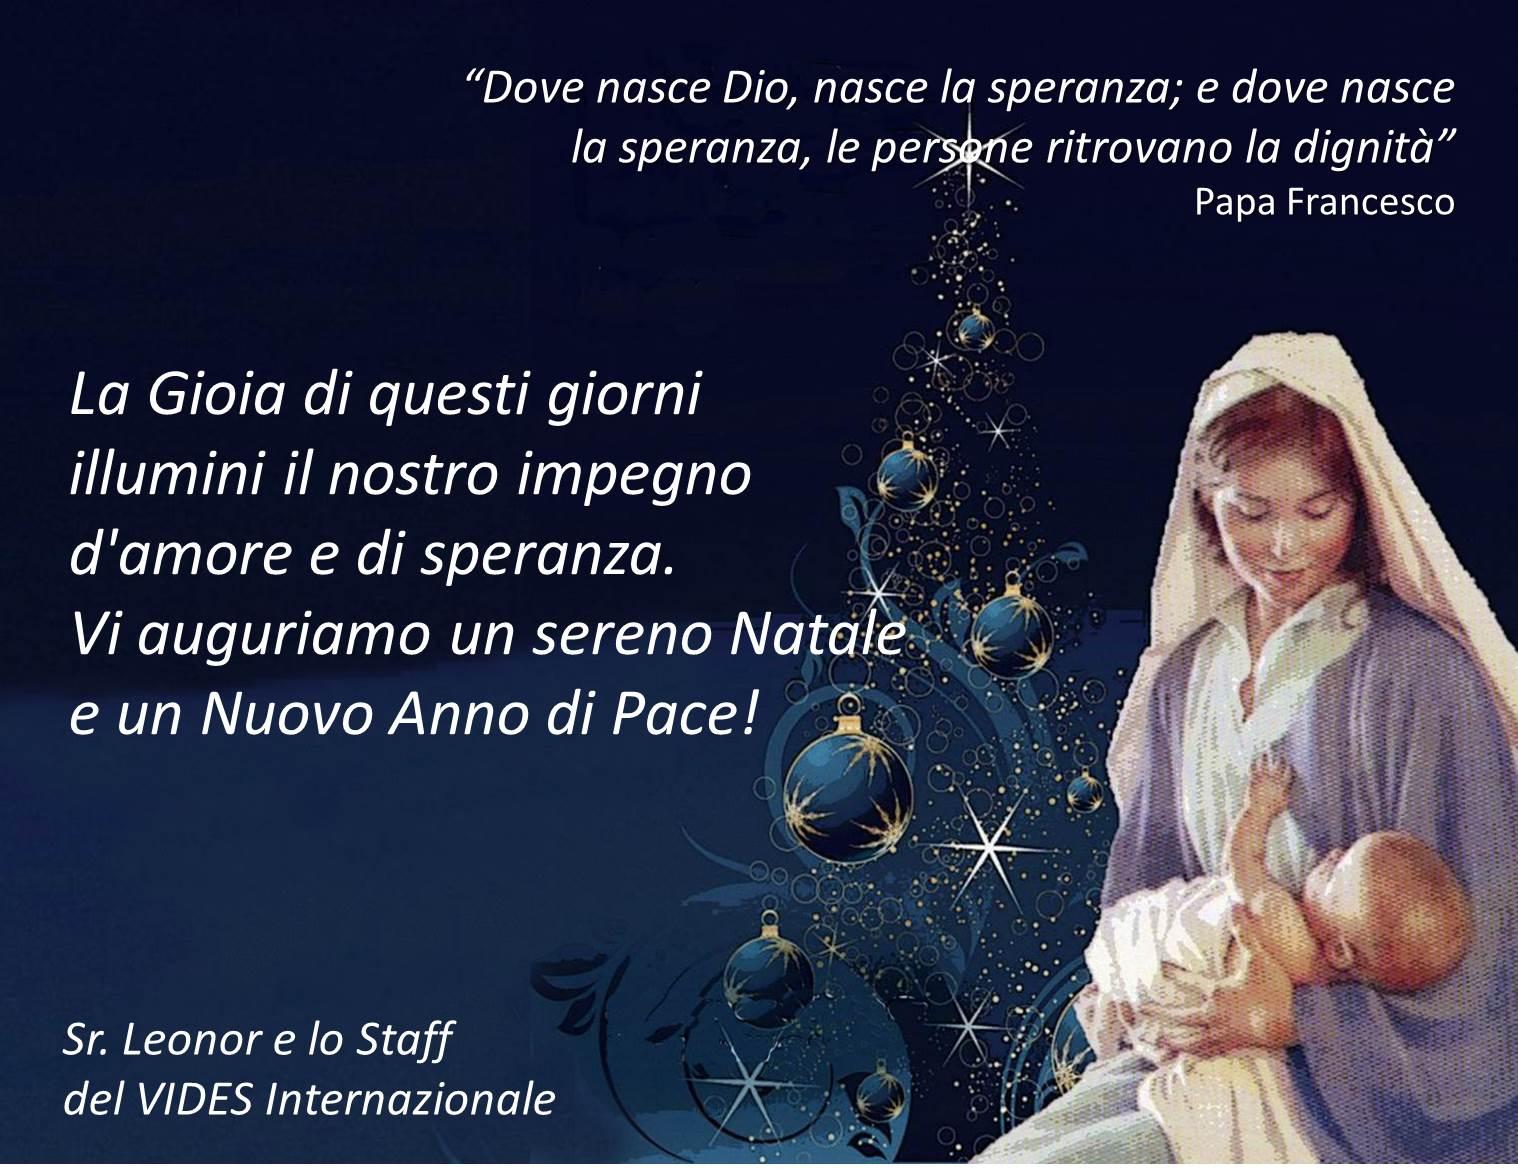 Auguri Di Natale Lunghi.Frasi Di Buon Natale Di Papa Francesco